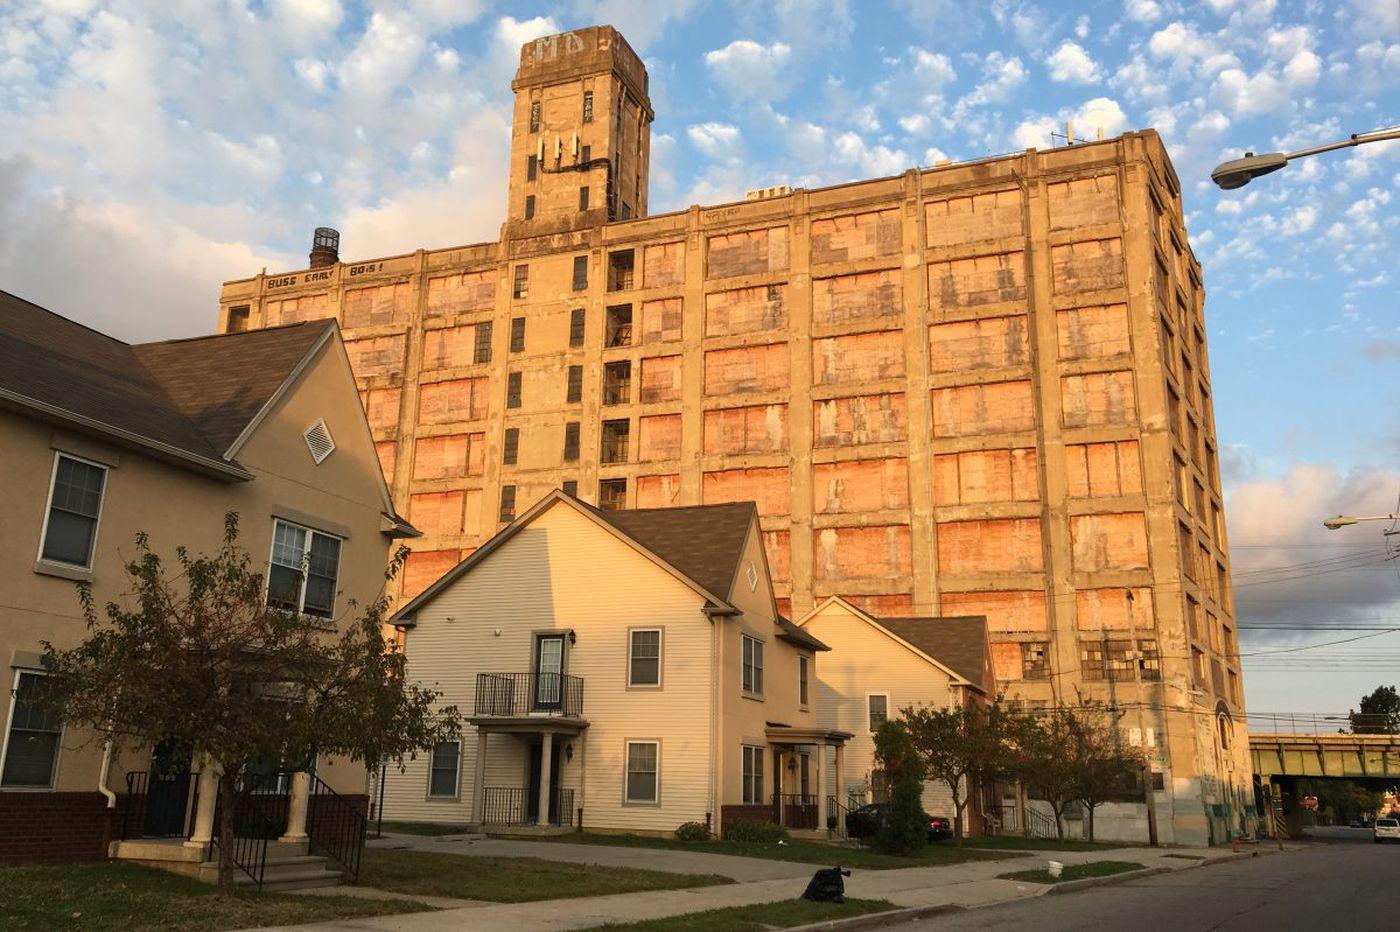 Trade union politics derail N. Philadelphia apartment proposal